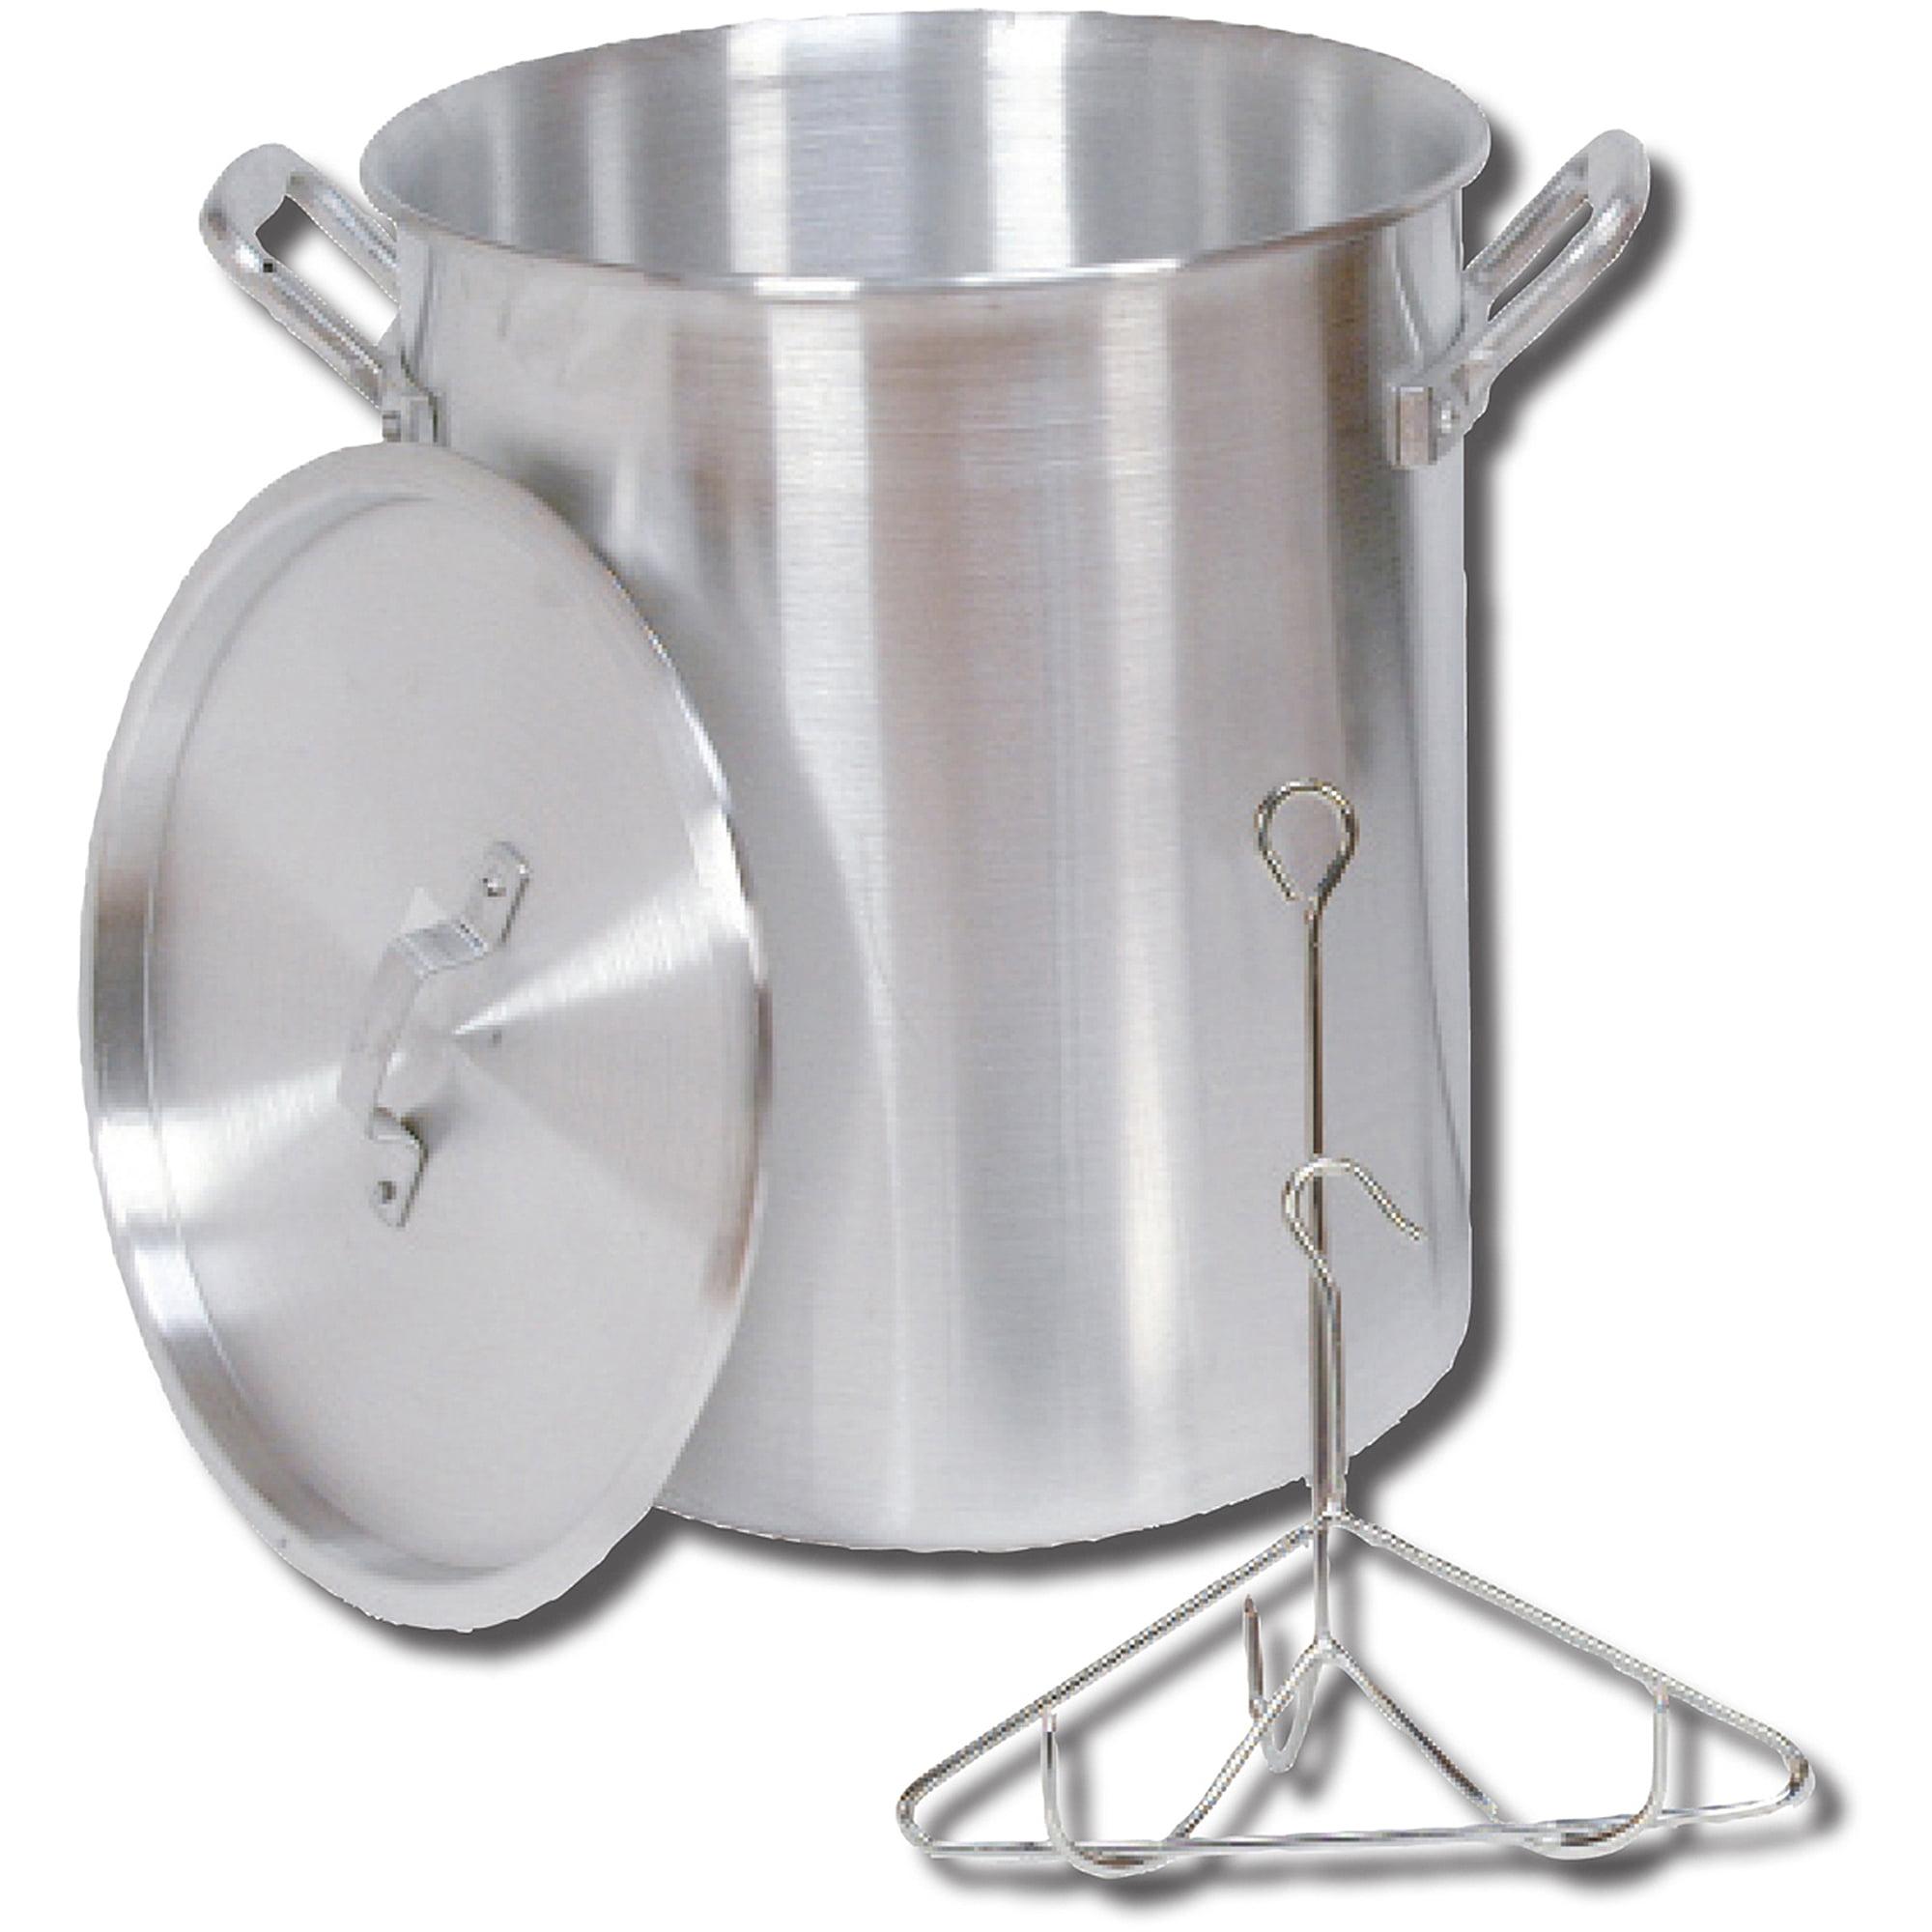 King Kooker Aluminum Turkey Cooking Pot Set